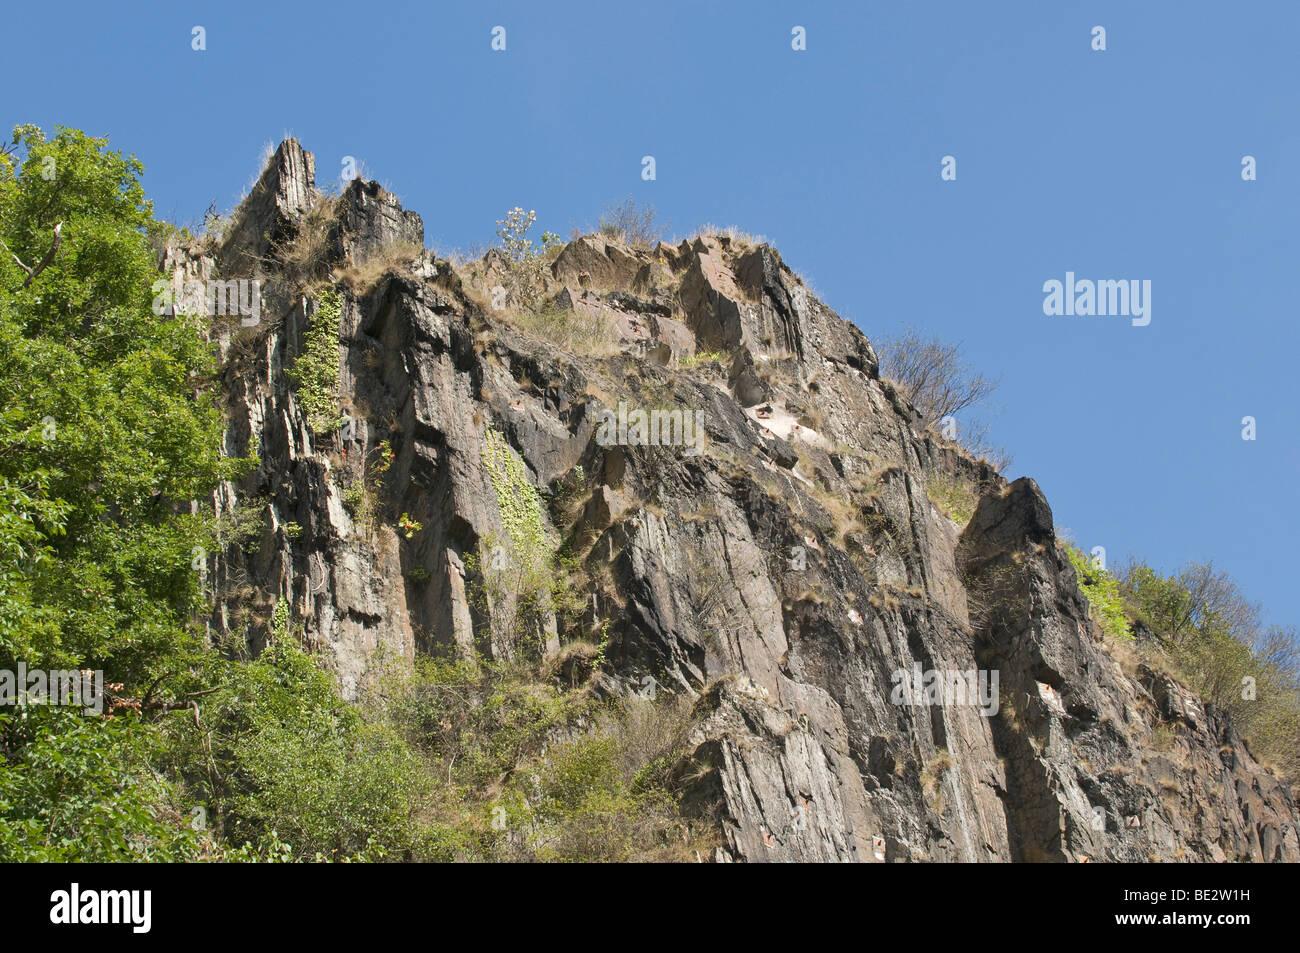 Jagged rocks, Altenahr, Ahrtal valley, Rhineland-Palatinate, Germany, Europe - Stock Image